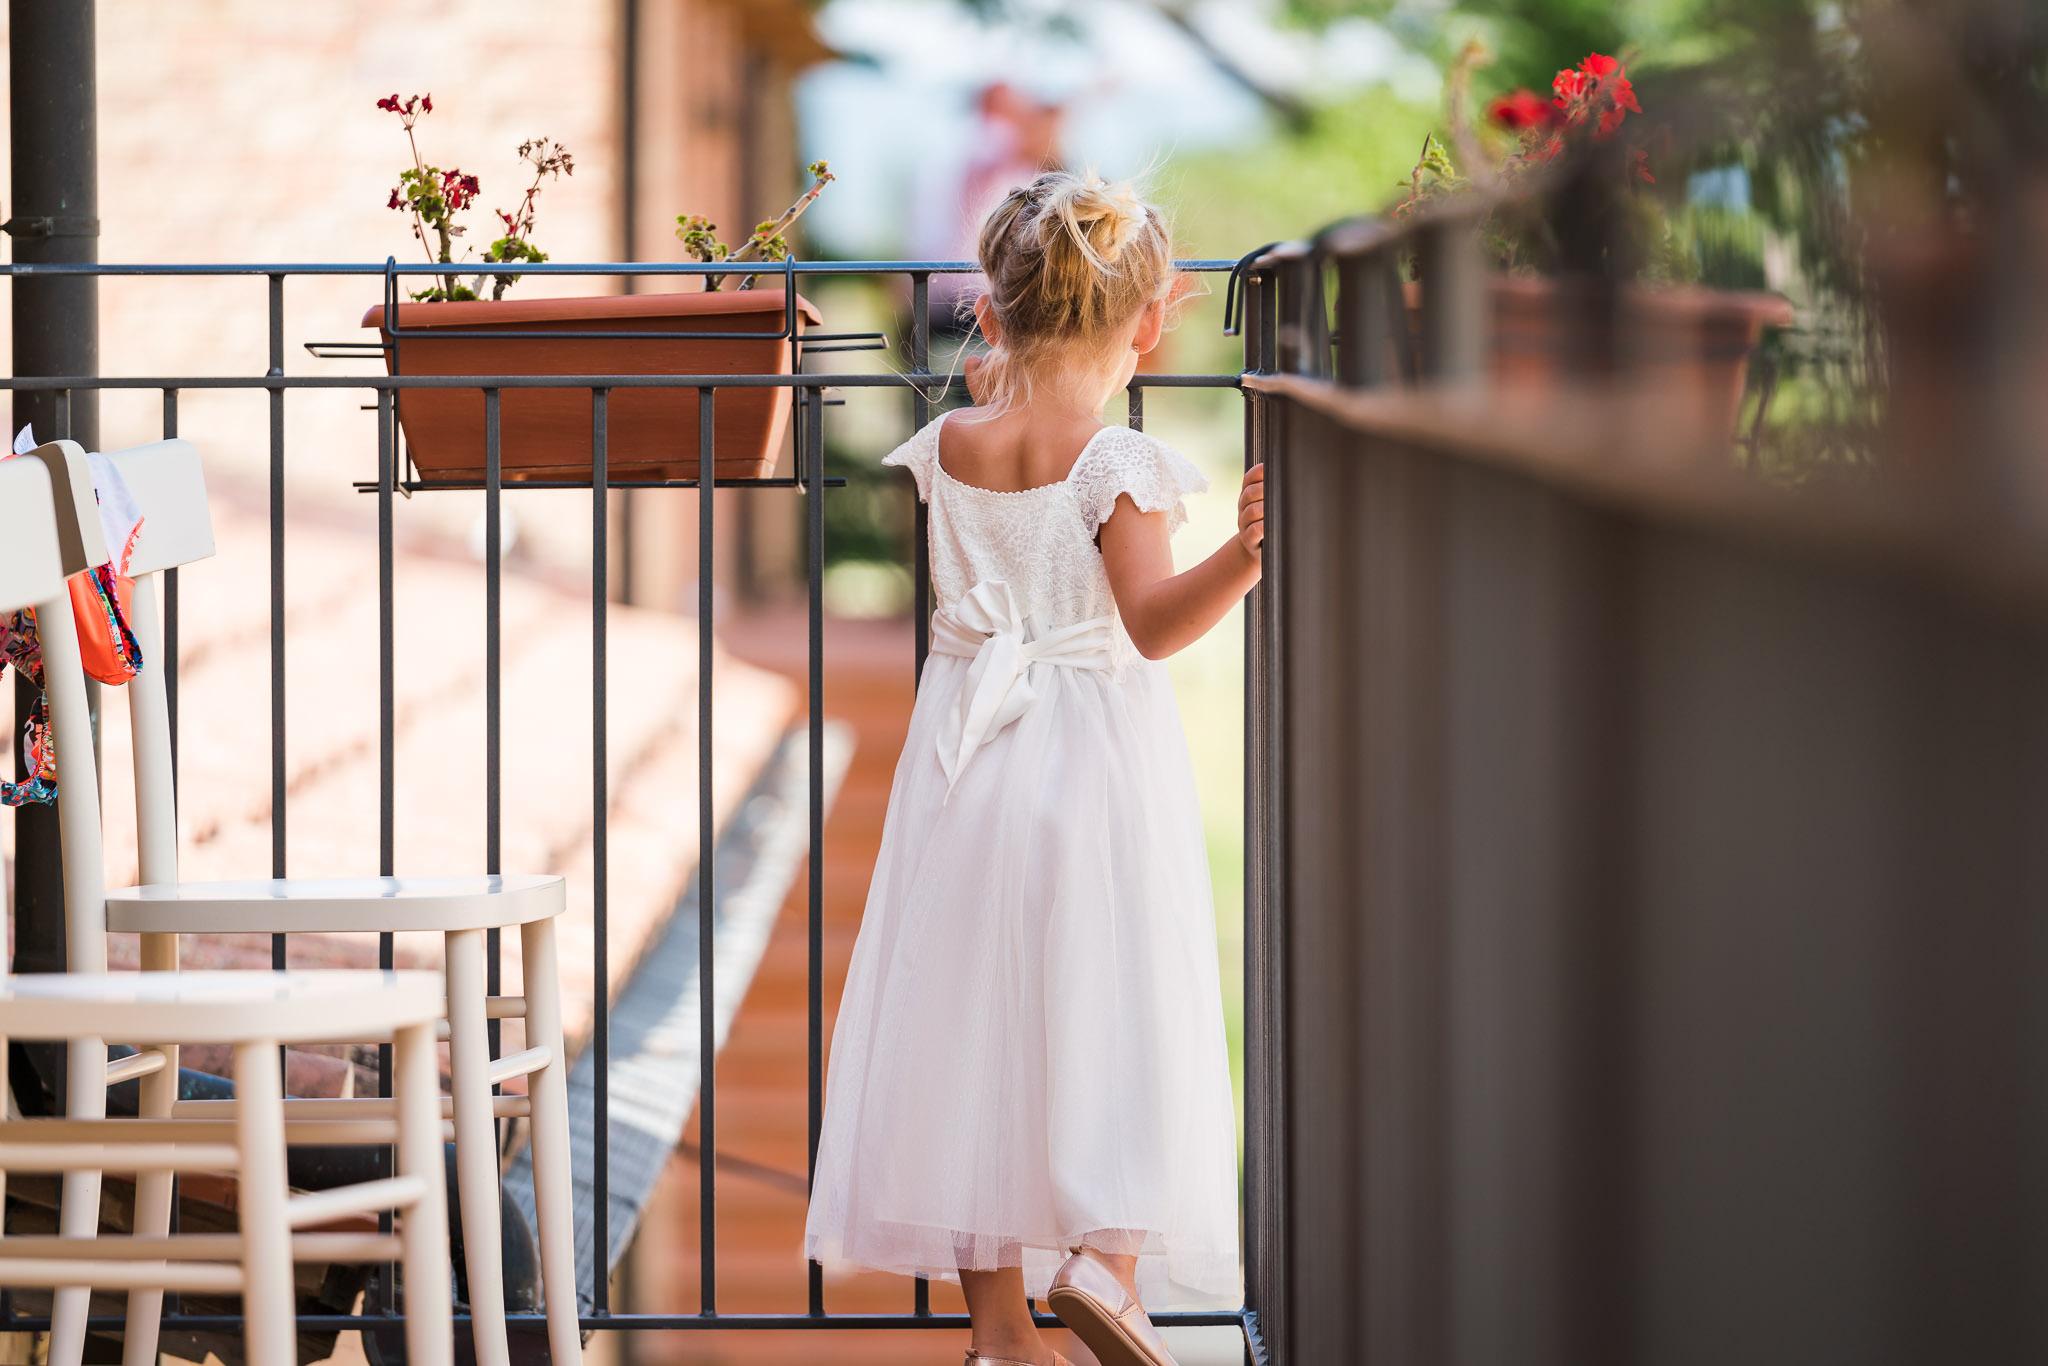 NC-2018-09-07_gemma-and-steve-wedding-1127.jpg